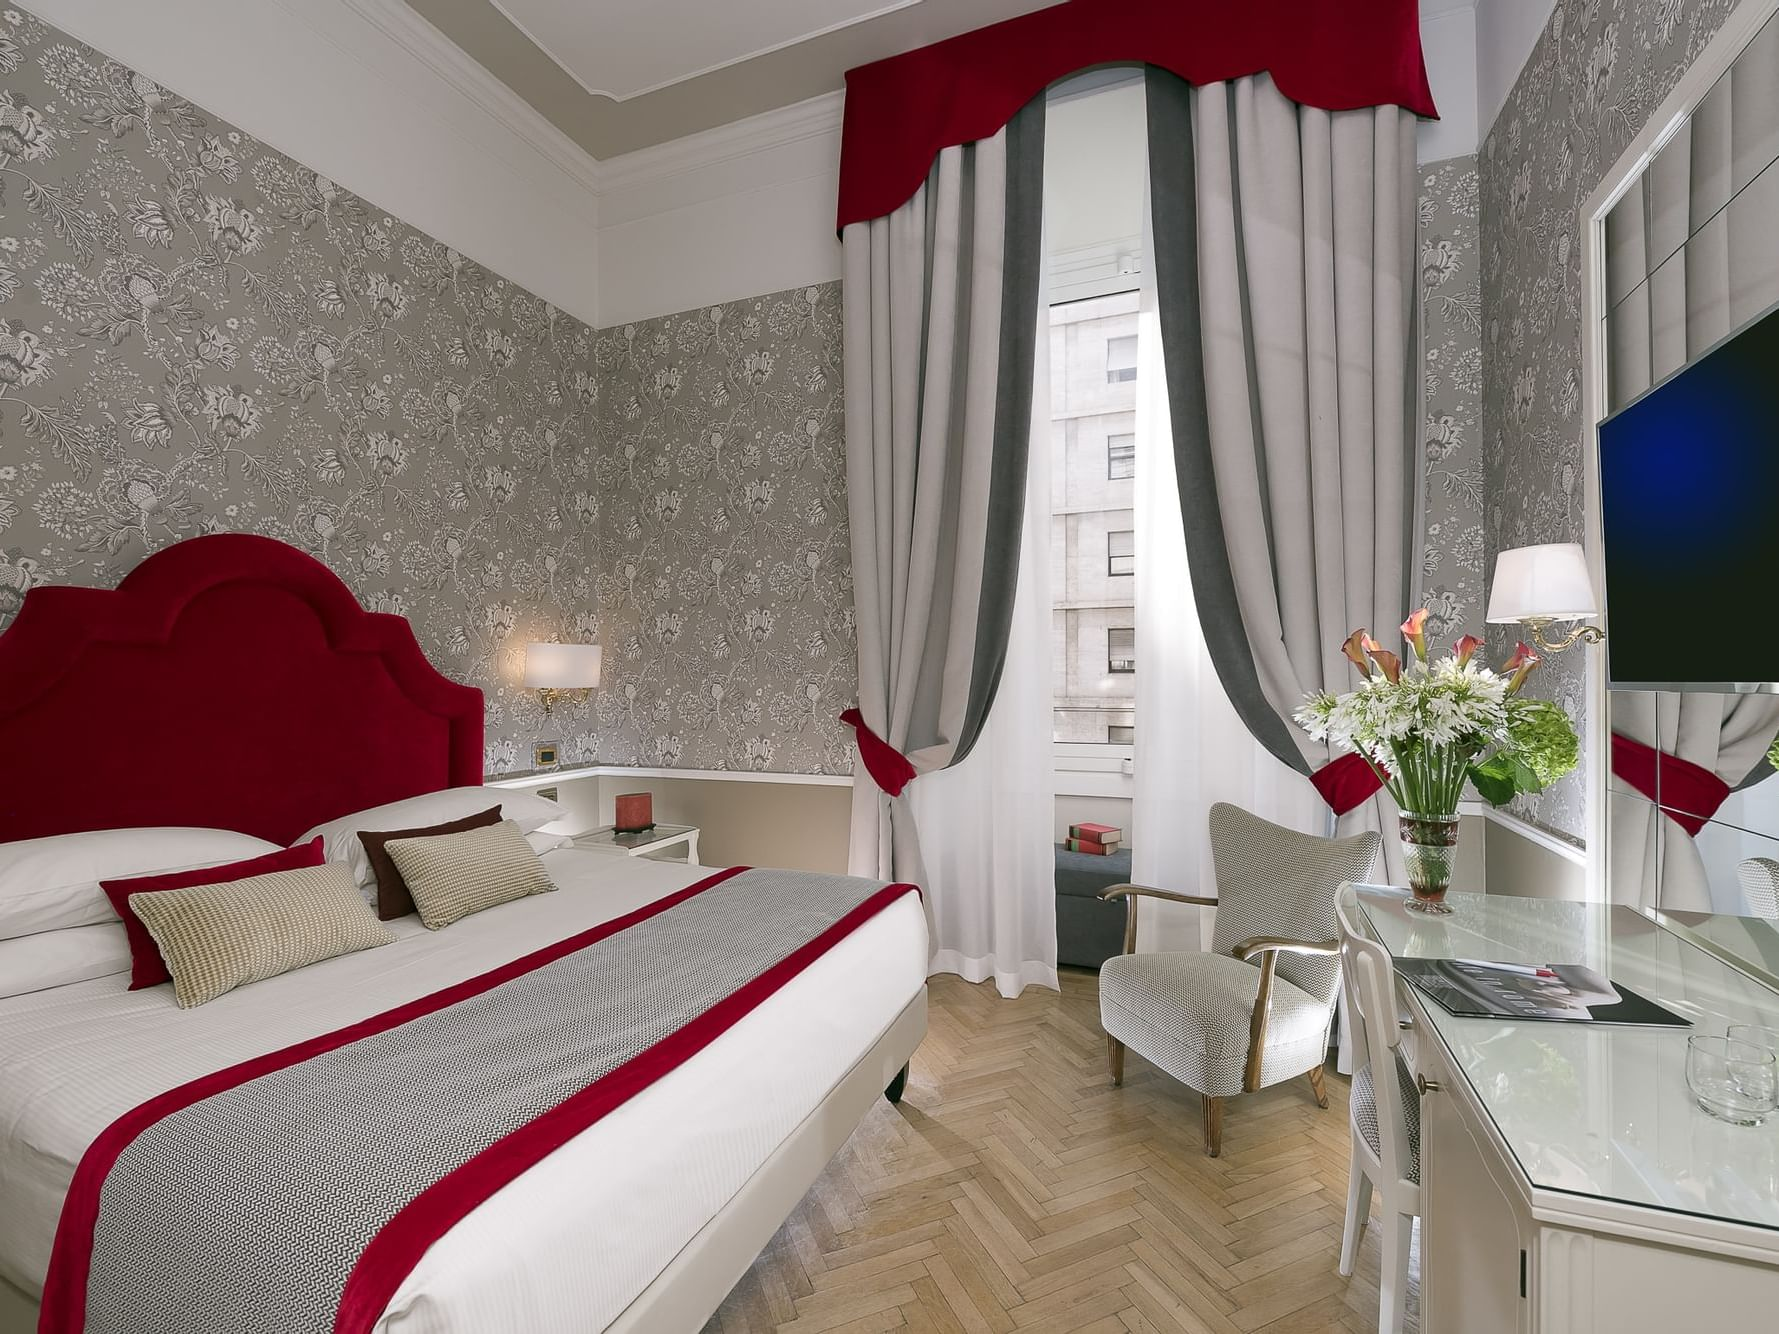 Camera Premium Bettoja Hotels